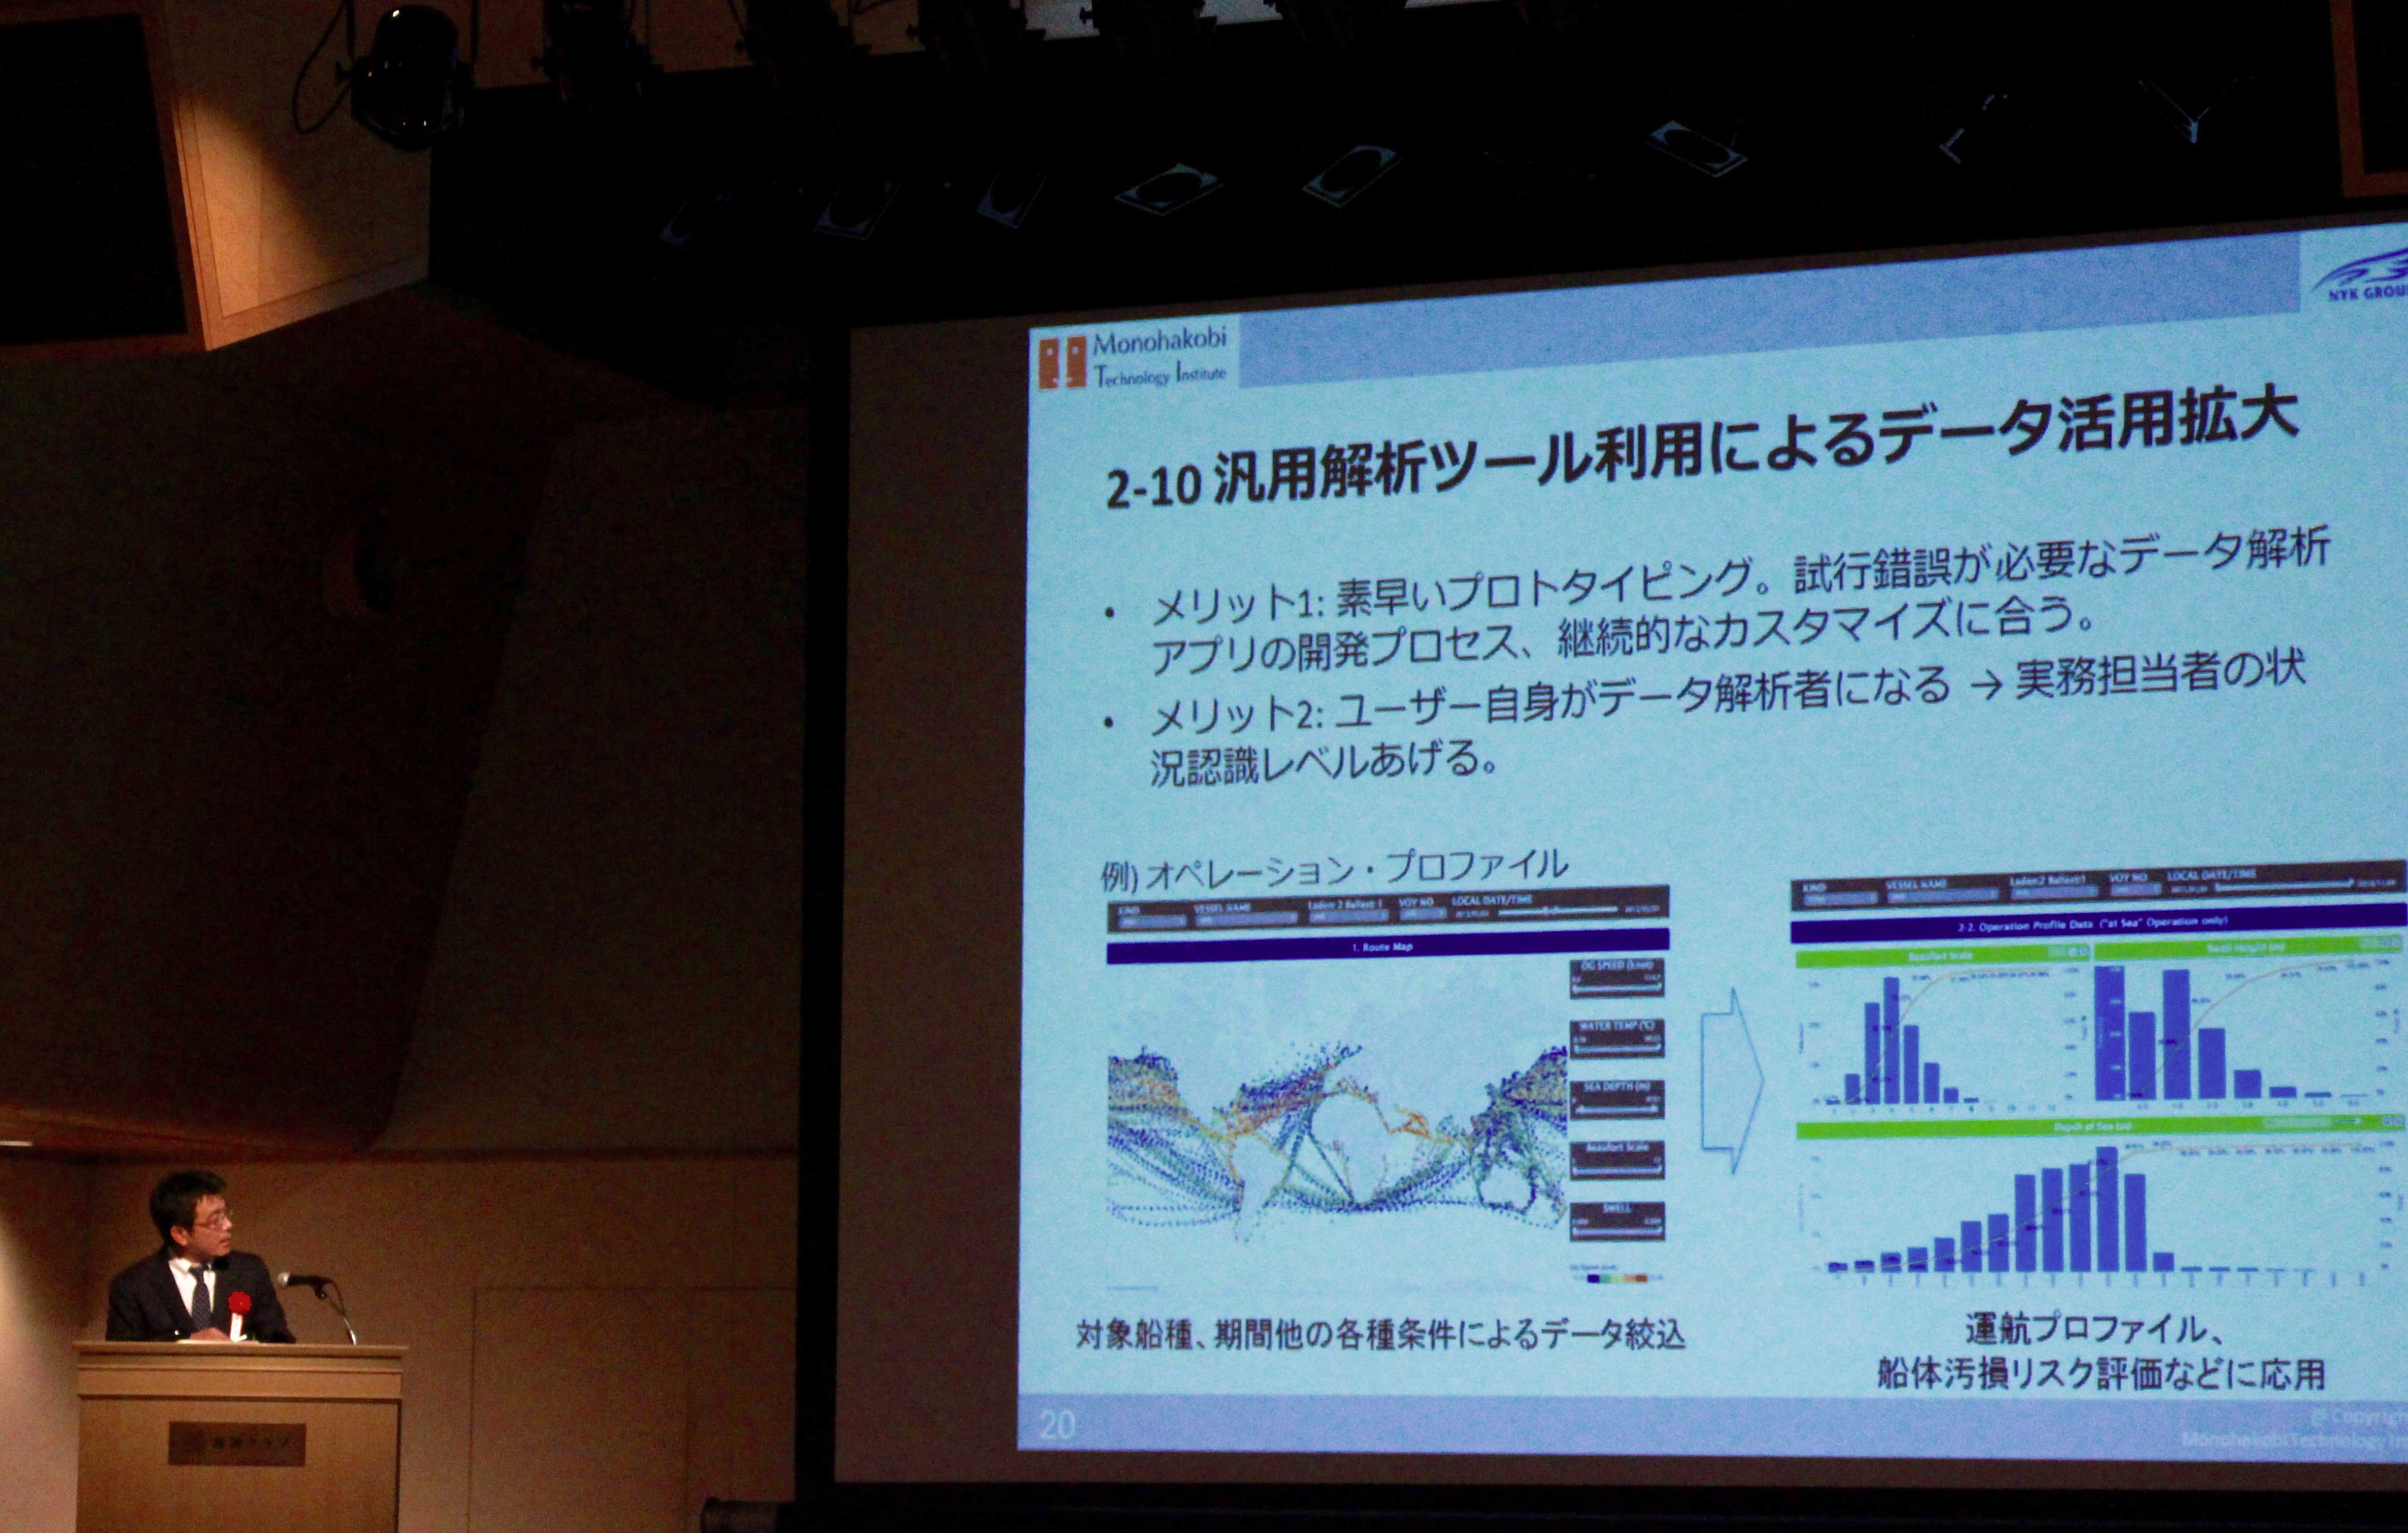 『Monohakobi Techno Forum』 講演の様子